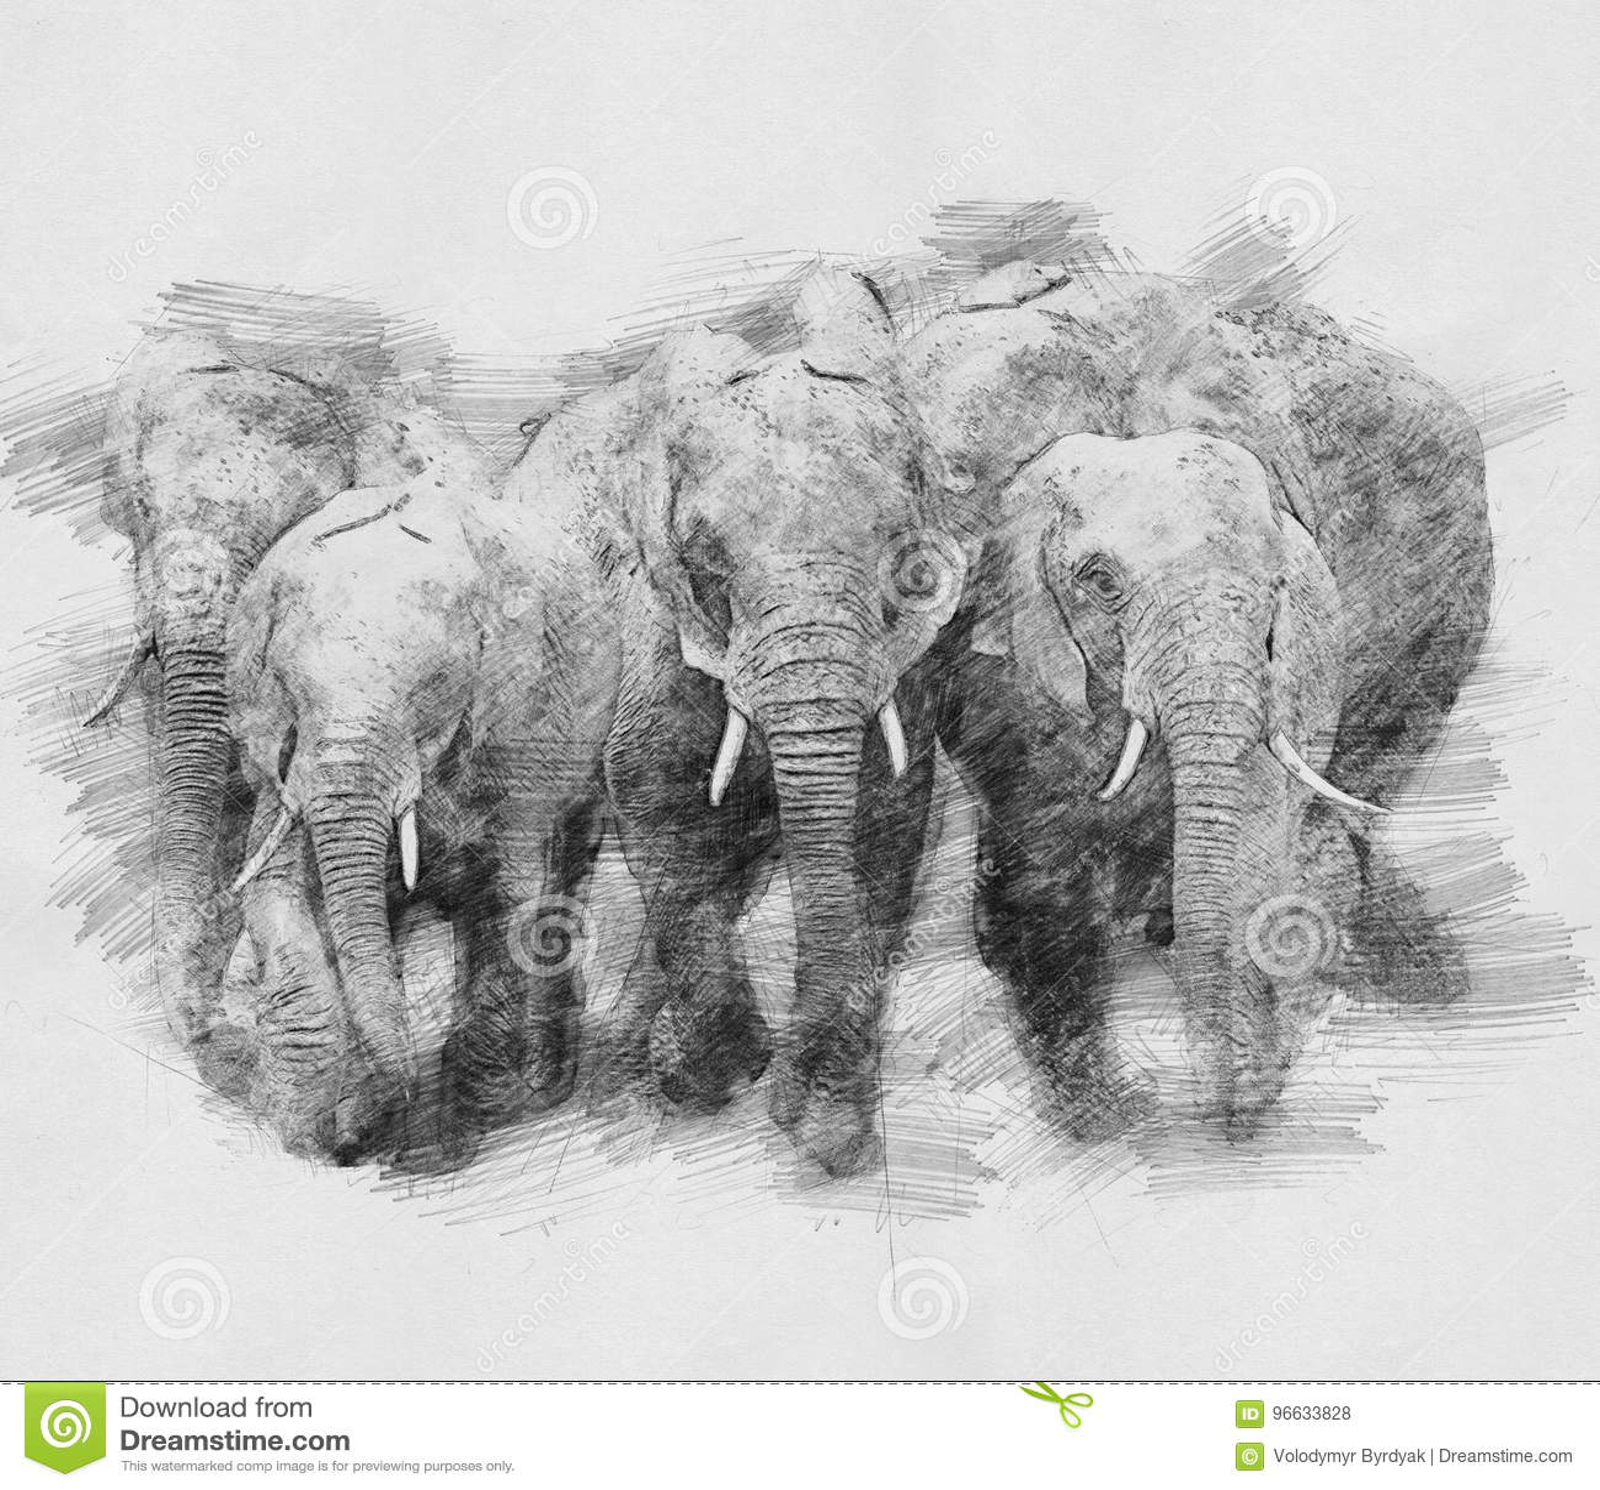 d48a9f2a9858 Elefant Skizze Mit Bleistift Stock Abbildung - Illustration von ...